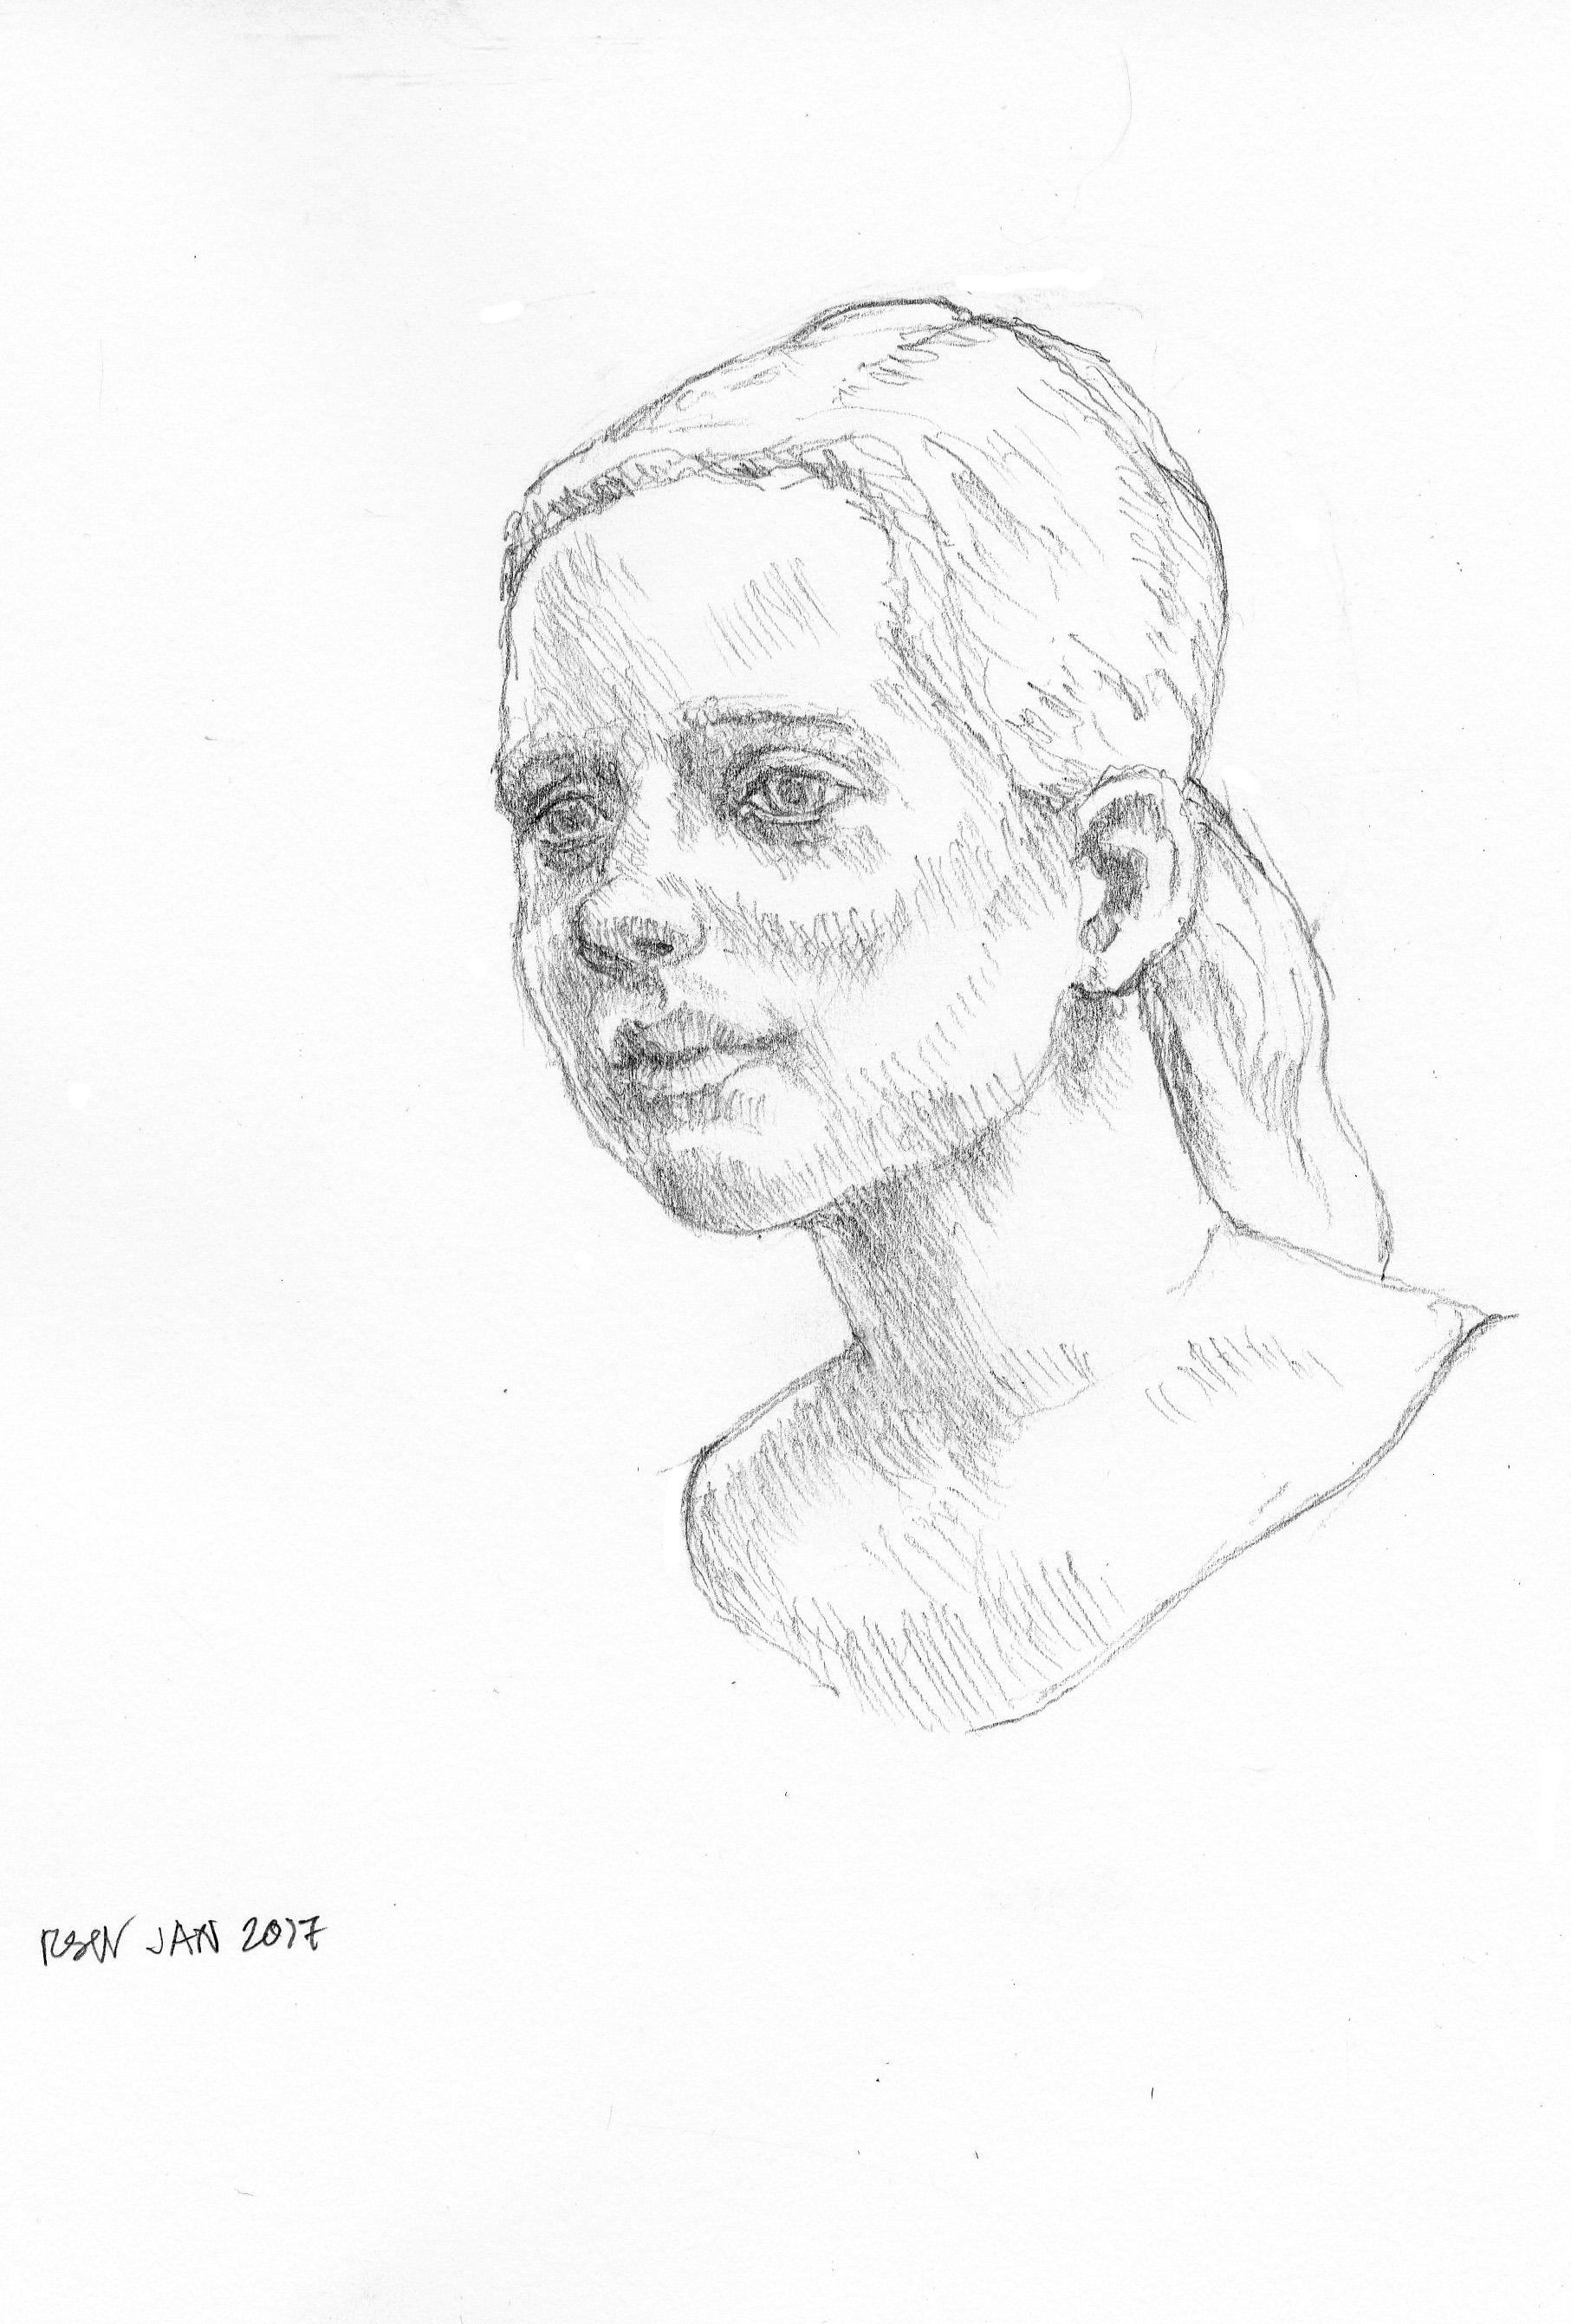 2017 Jan Feb sketches